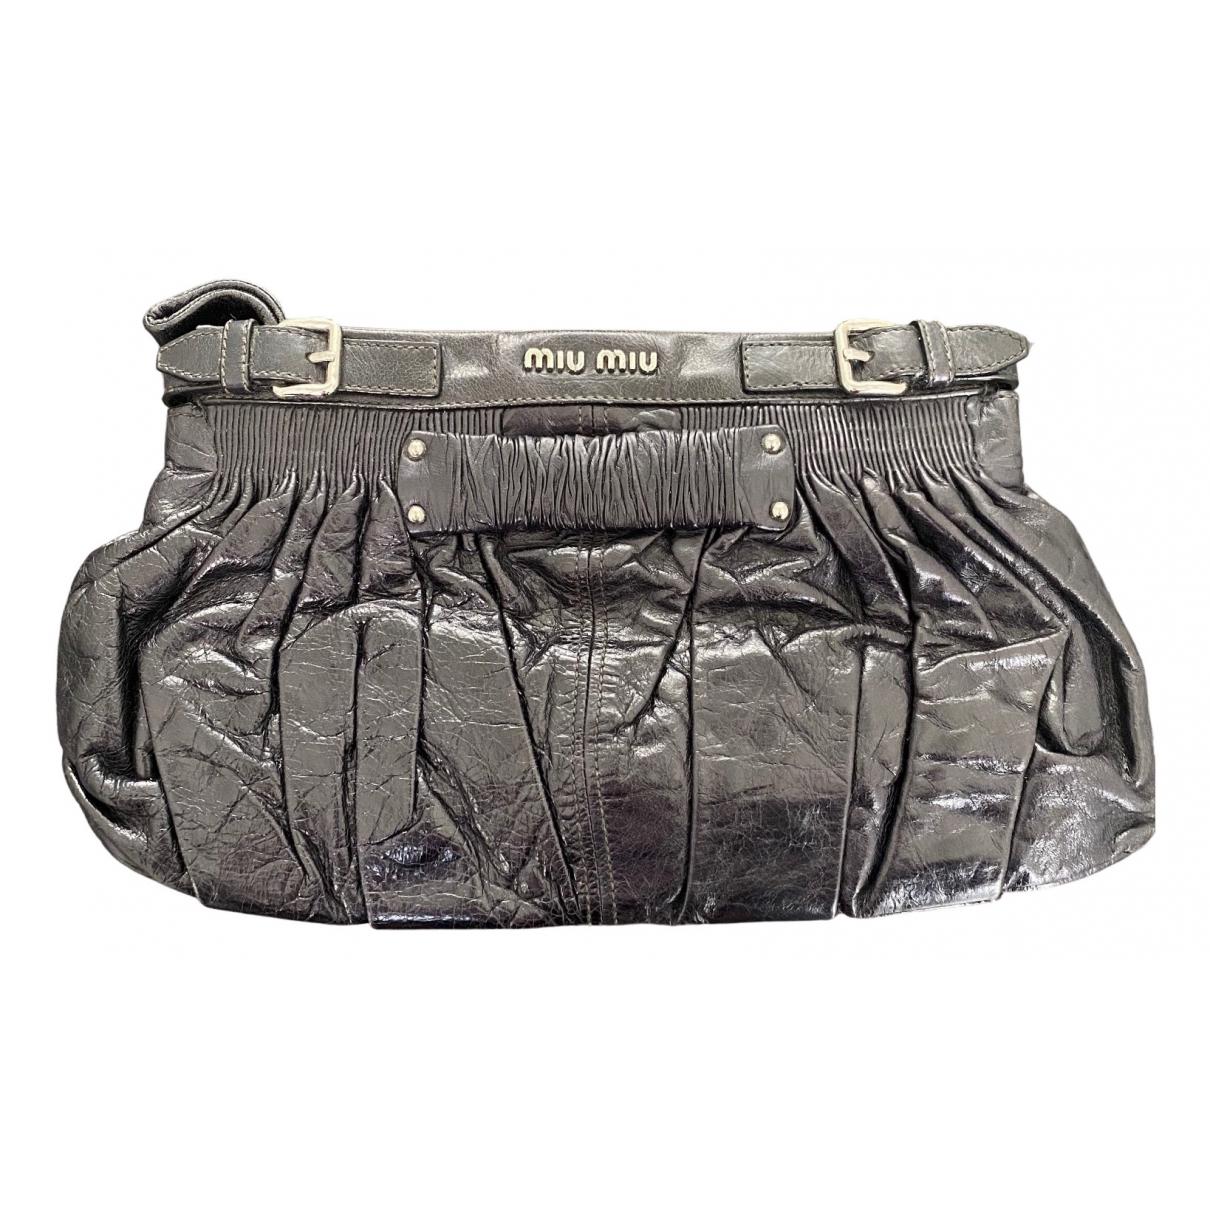 Miu Miu Matelassé Blue Leather handbag for Women \N